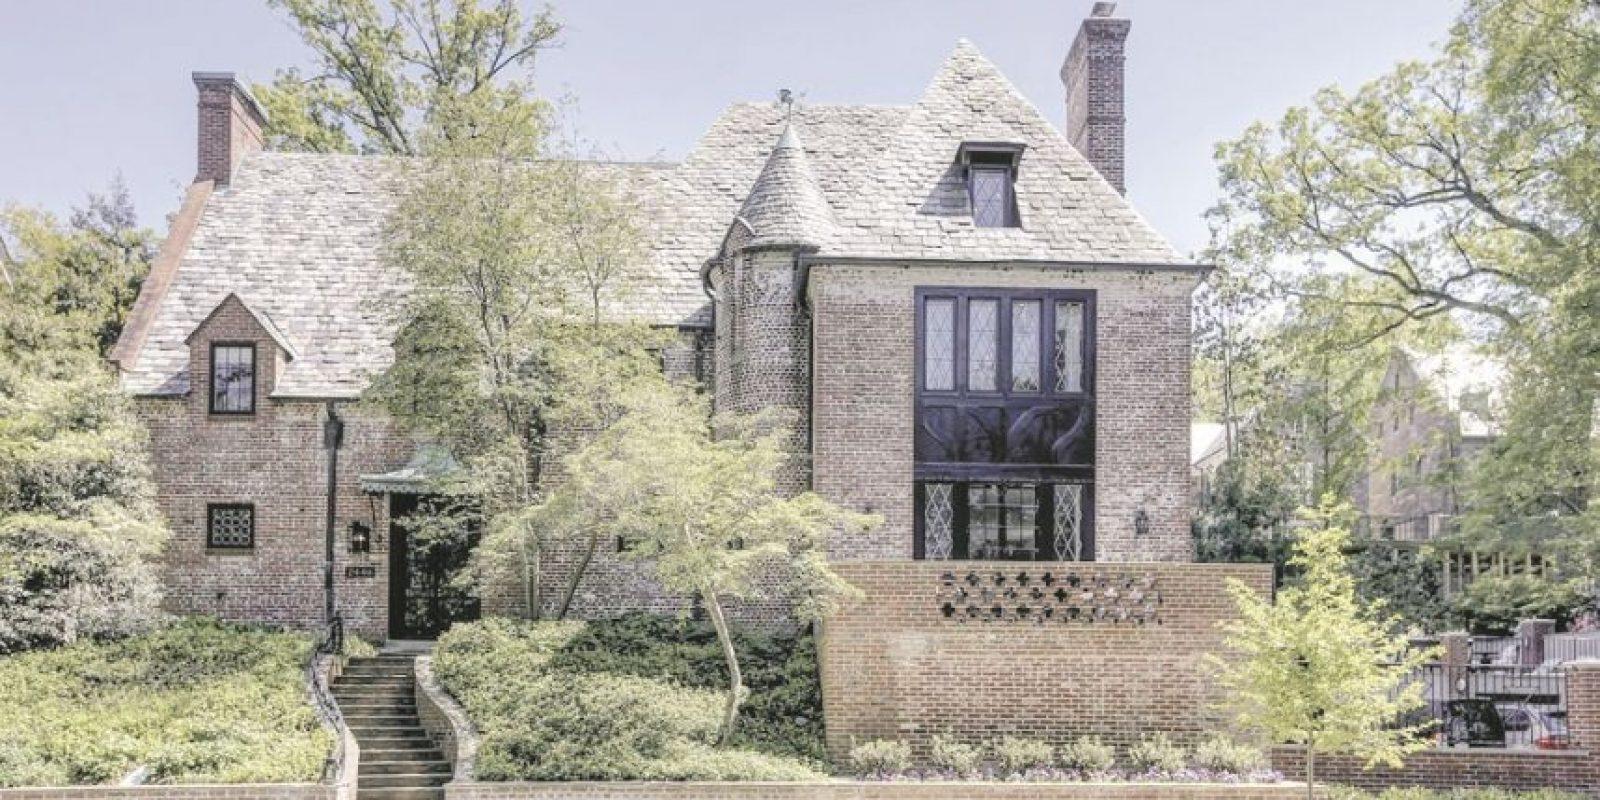 Así será la próxima residencia de Barack Obama tras abandonar la Casa Blanca. Foto:wfp.com